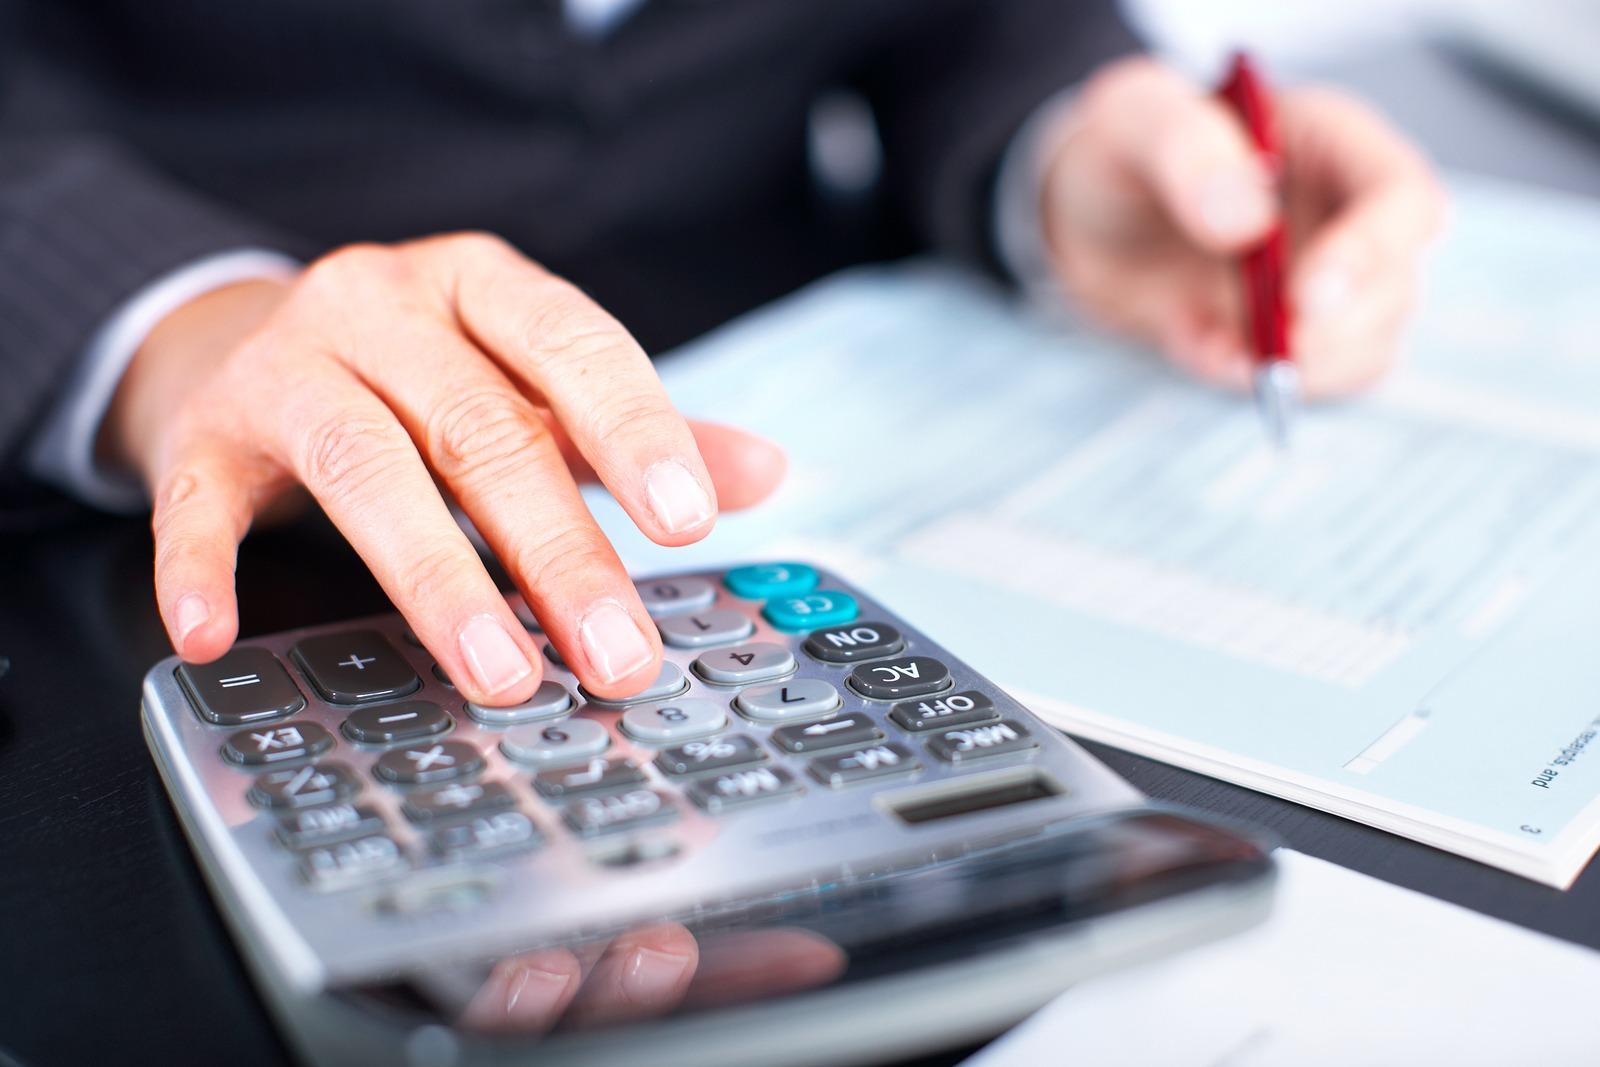 Alternative Financing & the Holiday Season - Small Business Survival